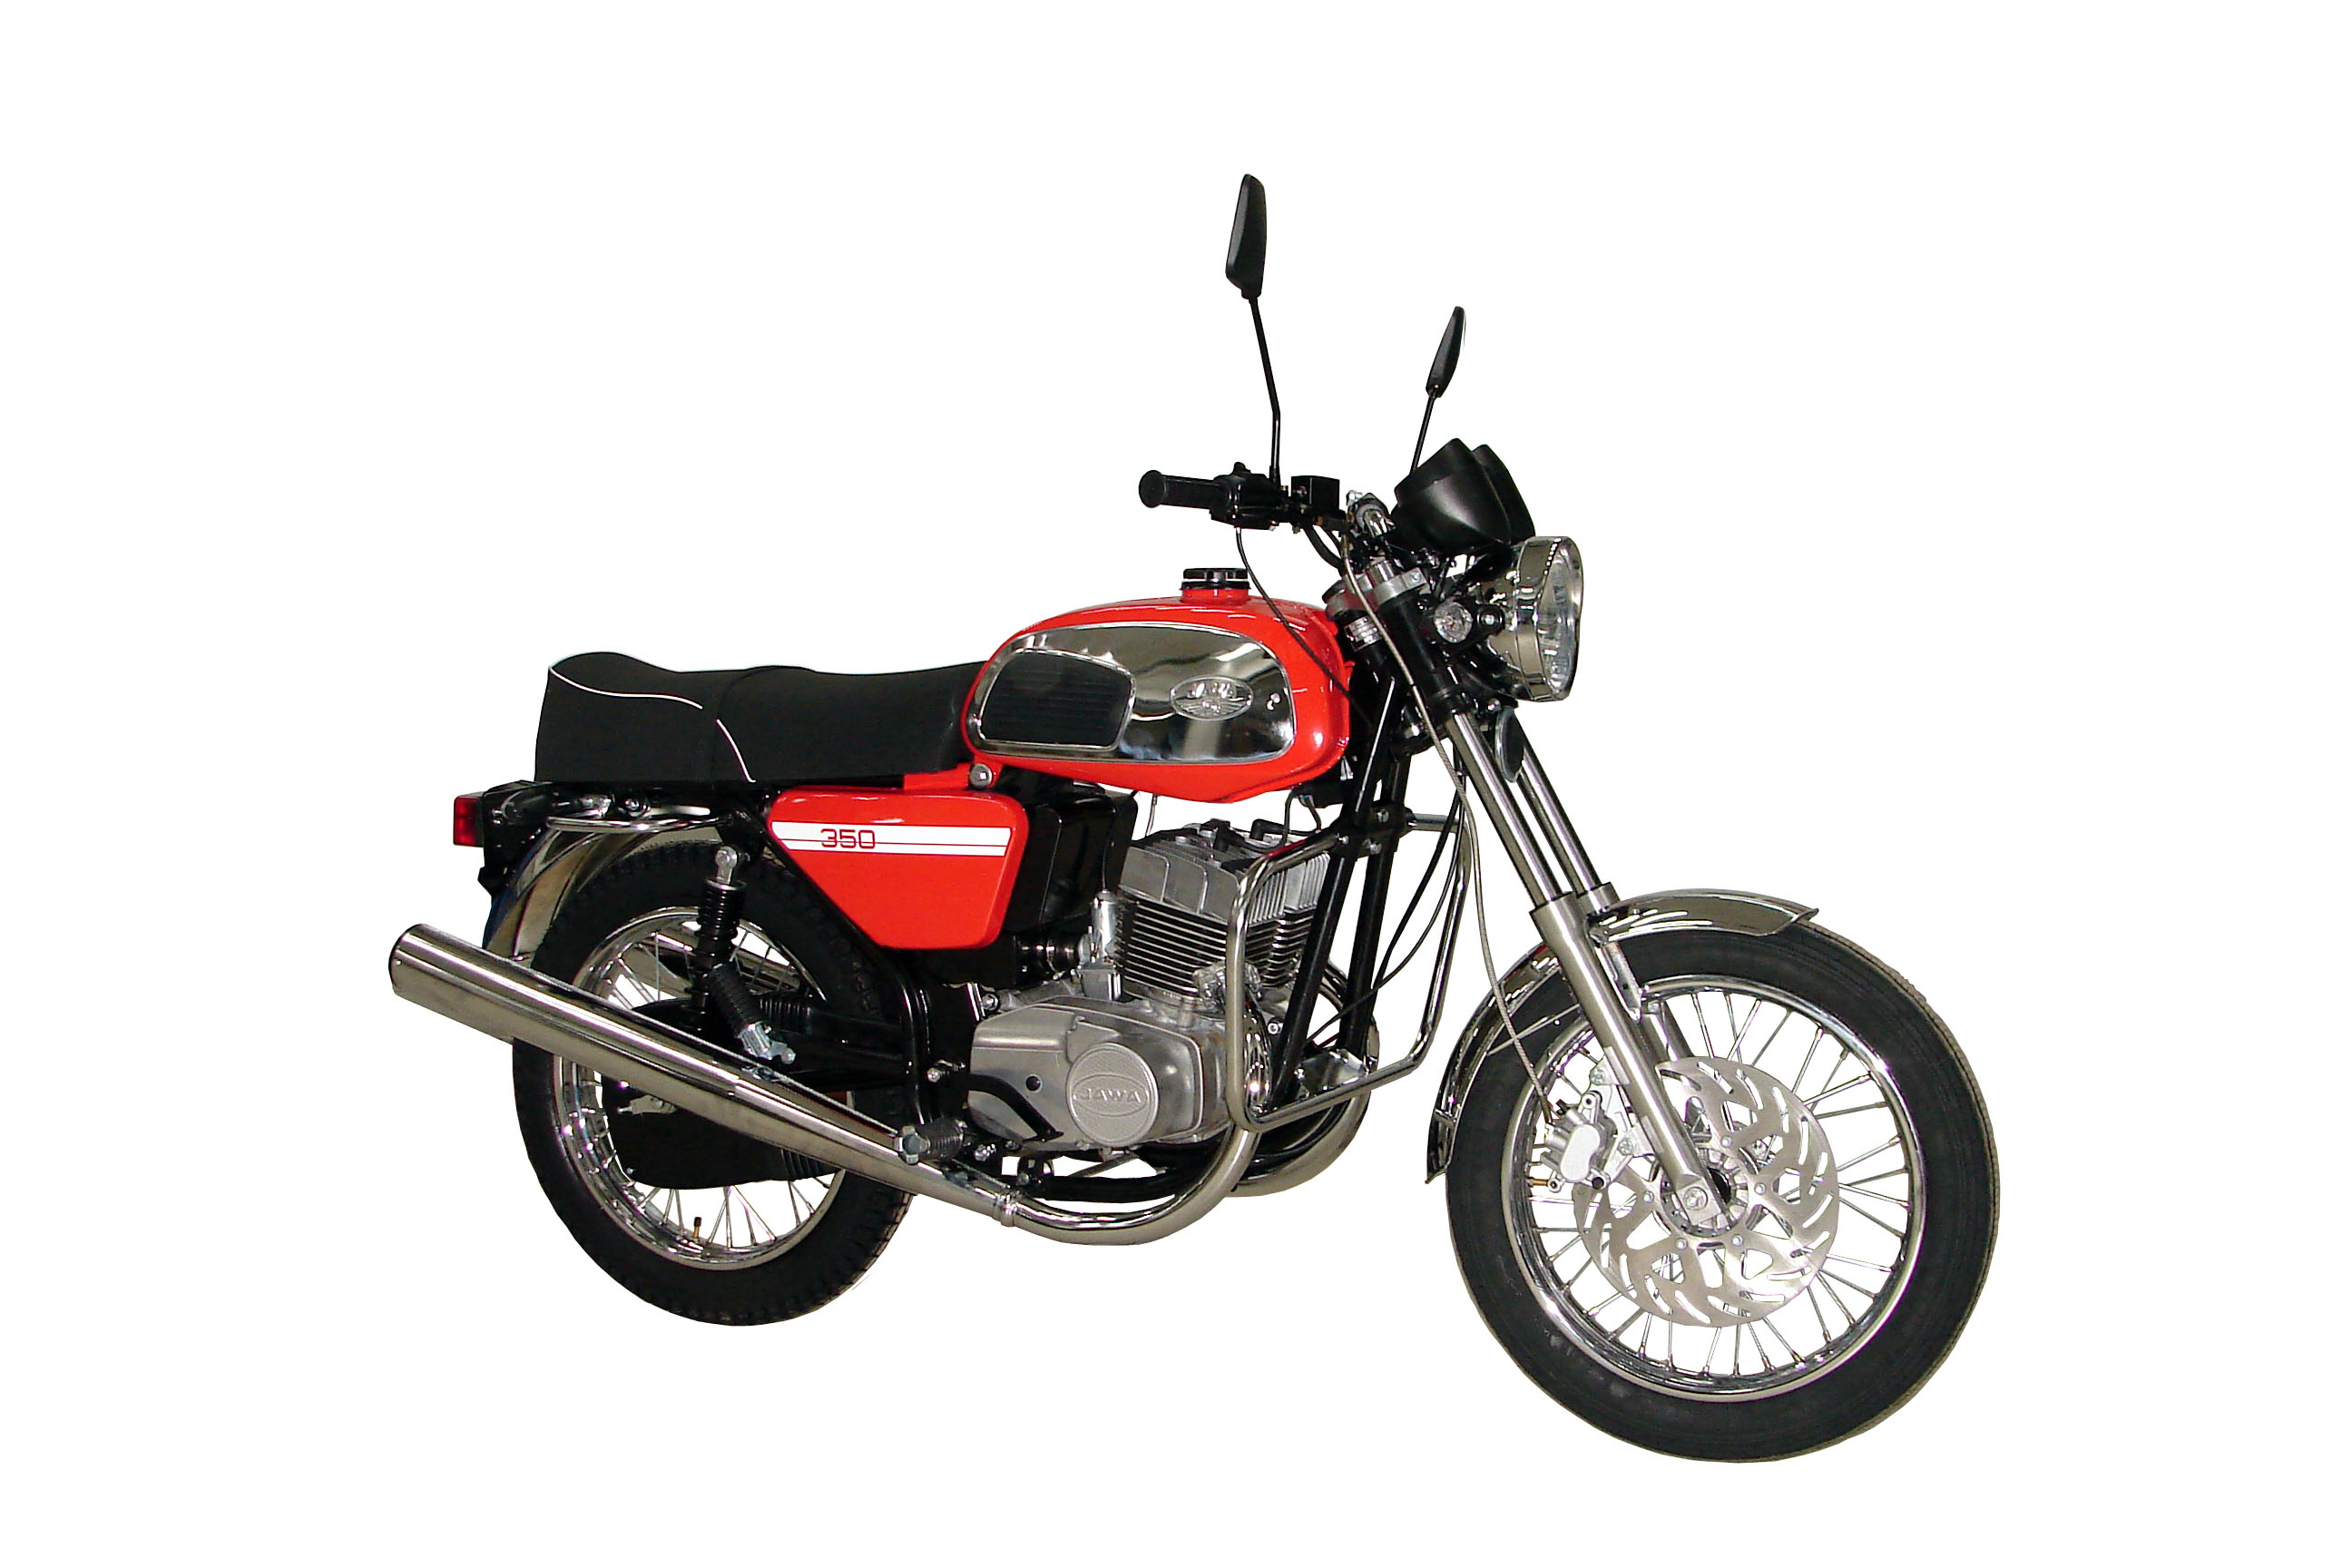 JAWA - Forum italiano dedicato alle moto Jawa e CZ - Portale 60-JAWA-350-typ-6401R-2013